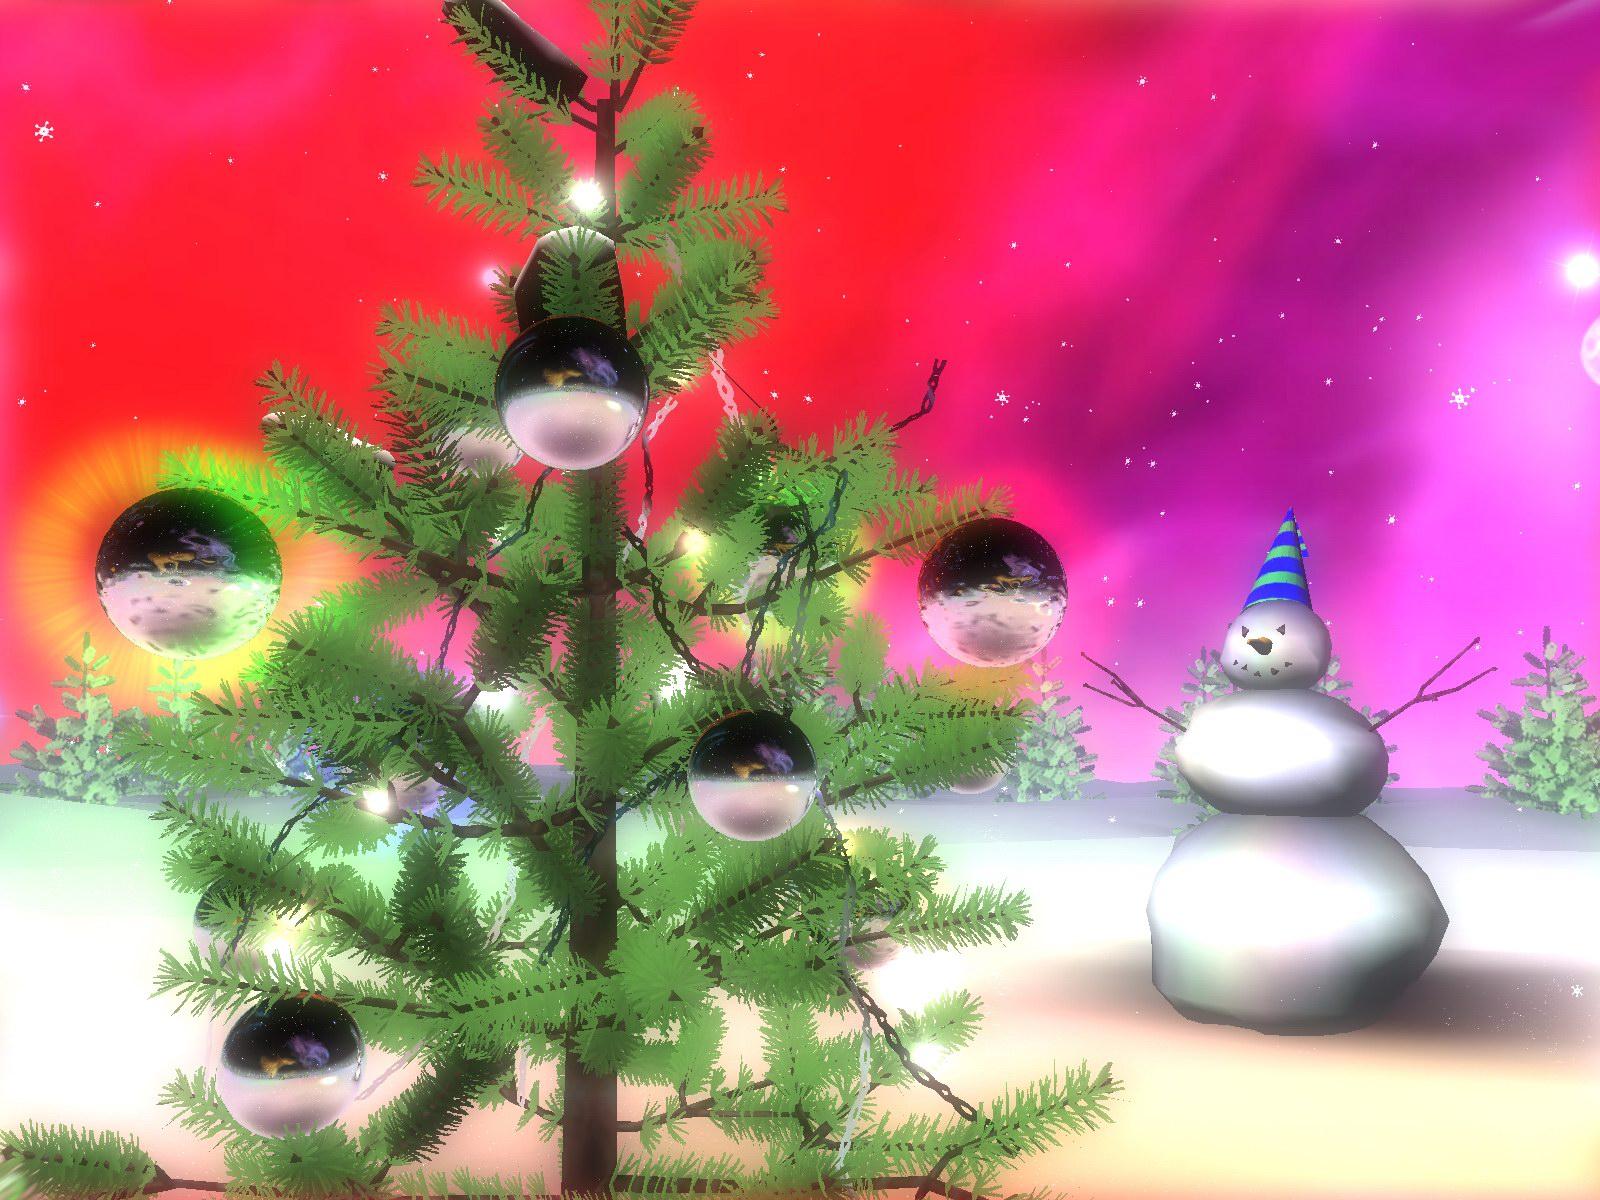 chirstmas christmas screensavers 1600x1200